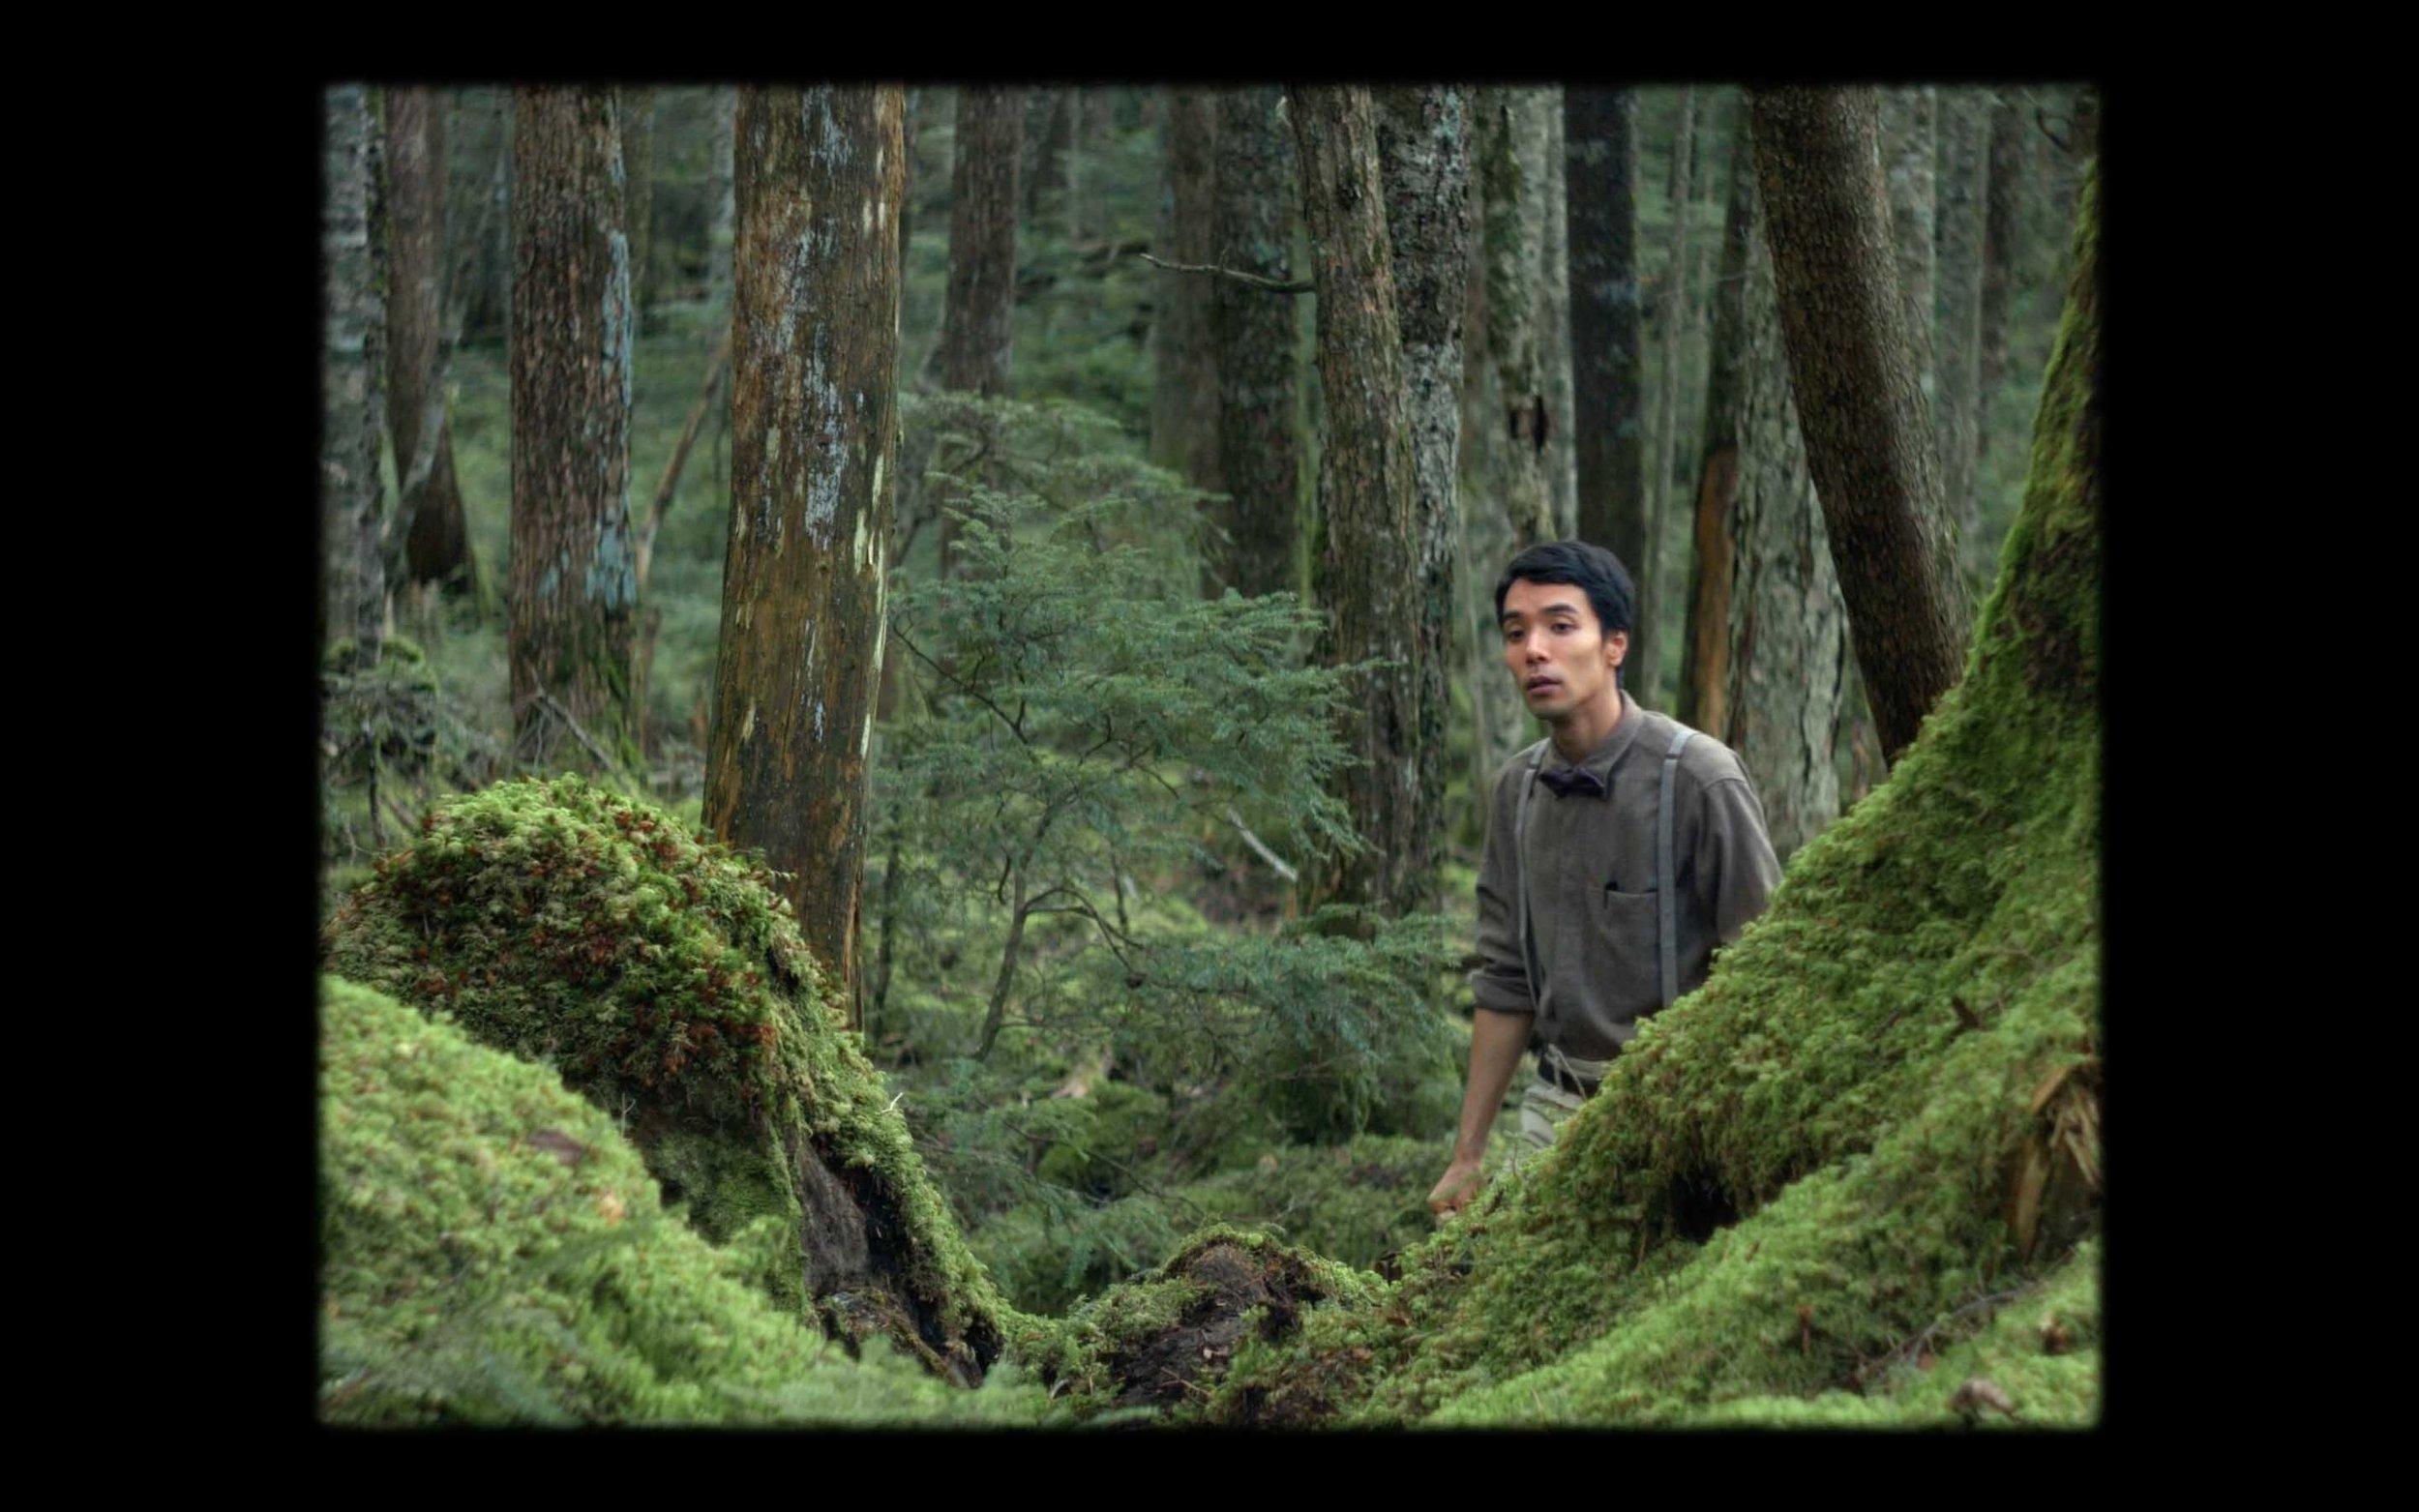 guy man forest japan cinematography hans bobanovits dop tokyo japan